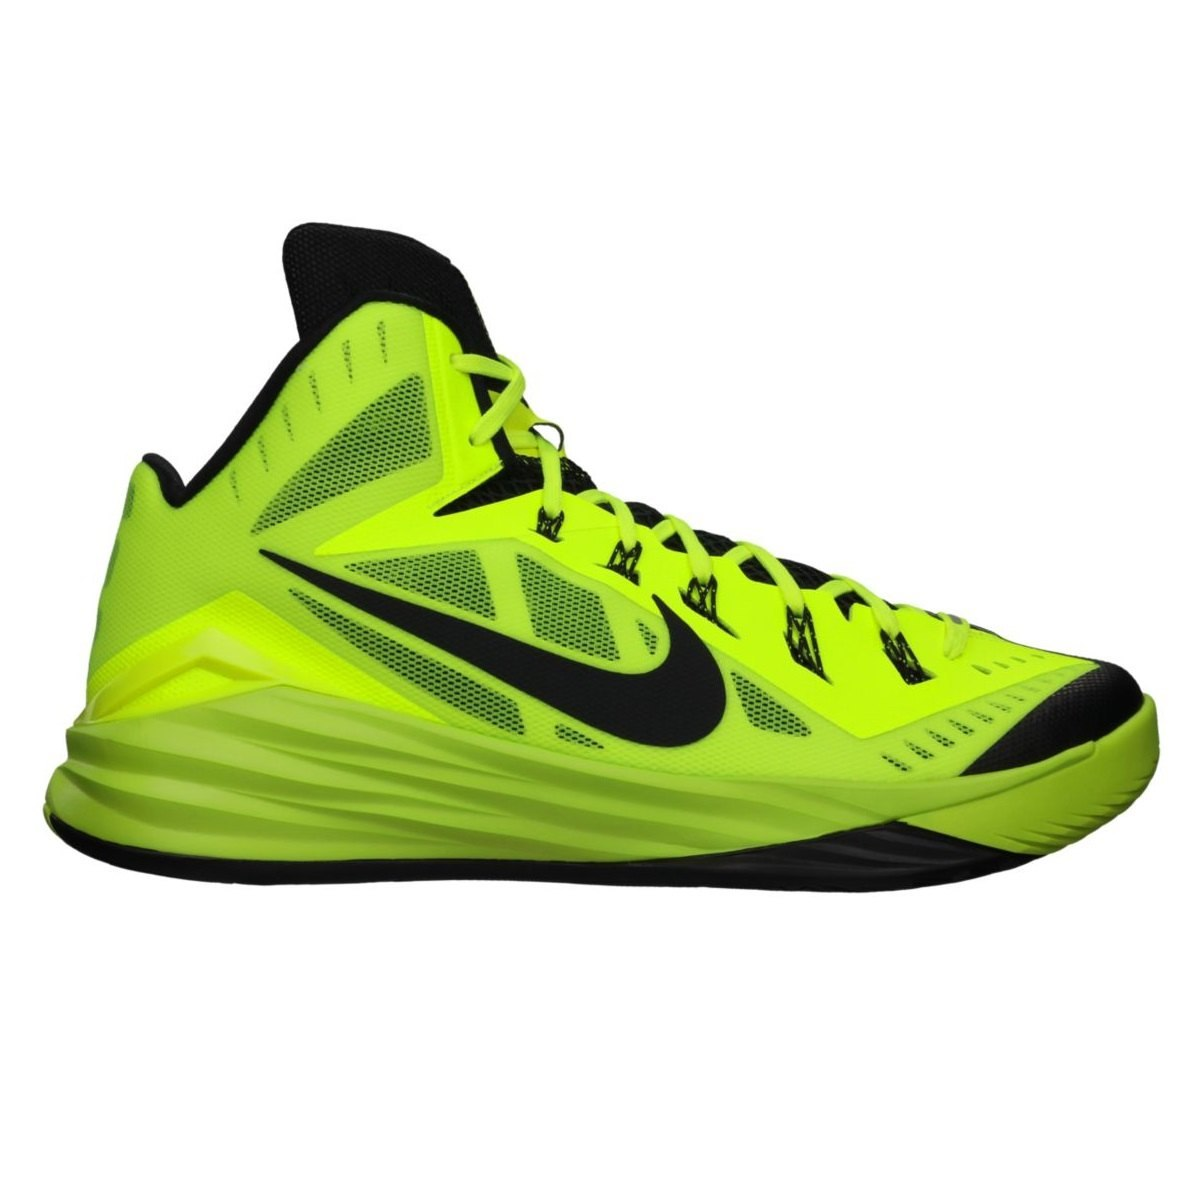 Nike Basketballschuhe Herren